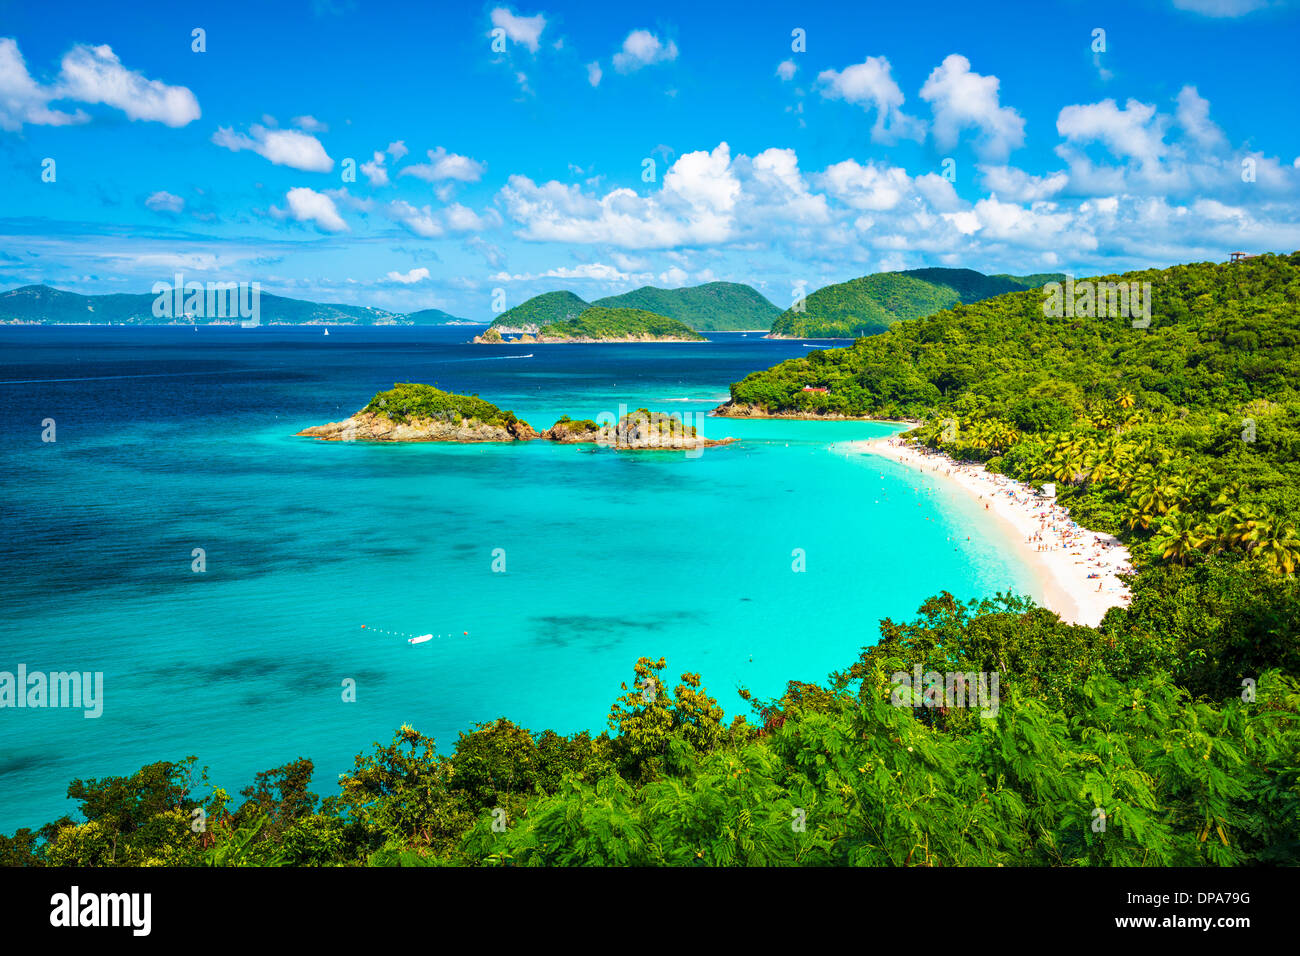 Trunk Bay, St. John, Amerikanische Jungferninseln. Stockbild